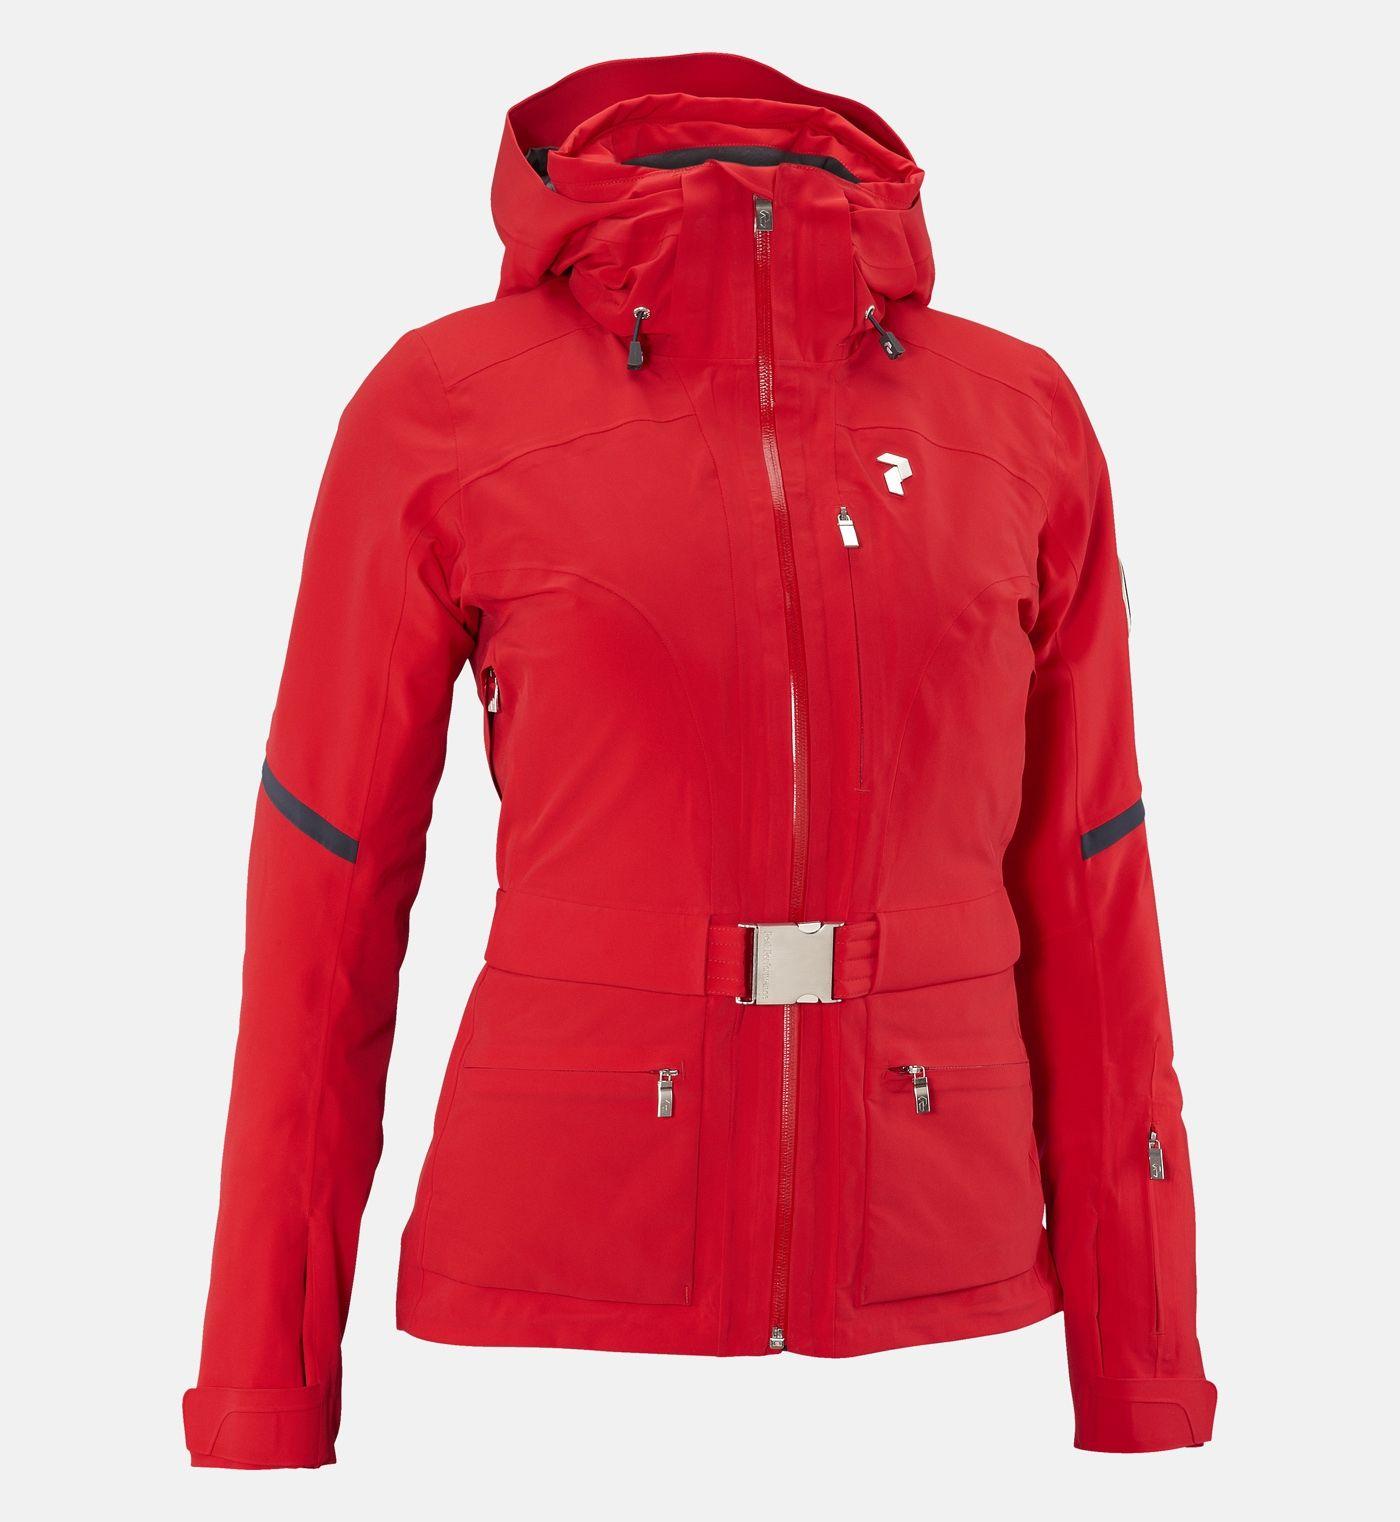 ede2161b465a66 Women s Supreme Turin Jacket - supreme